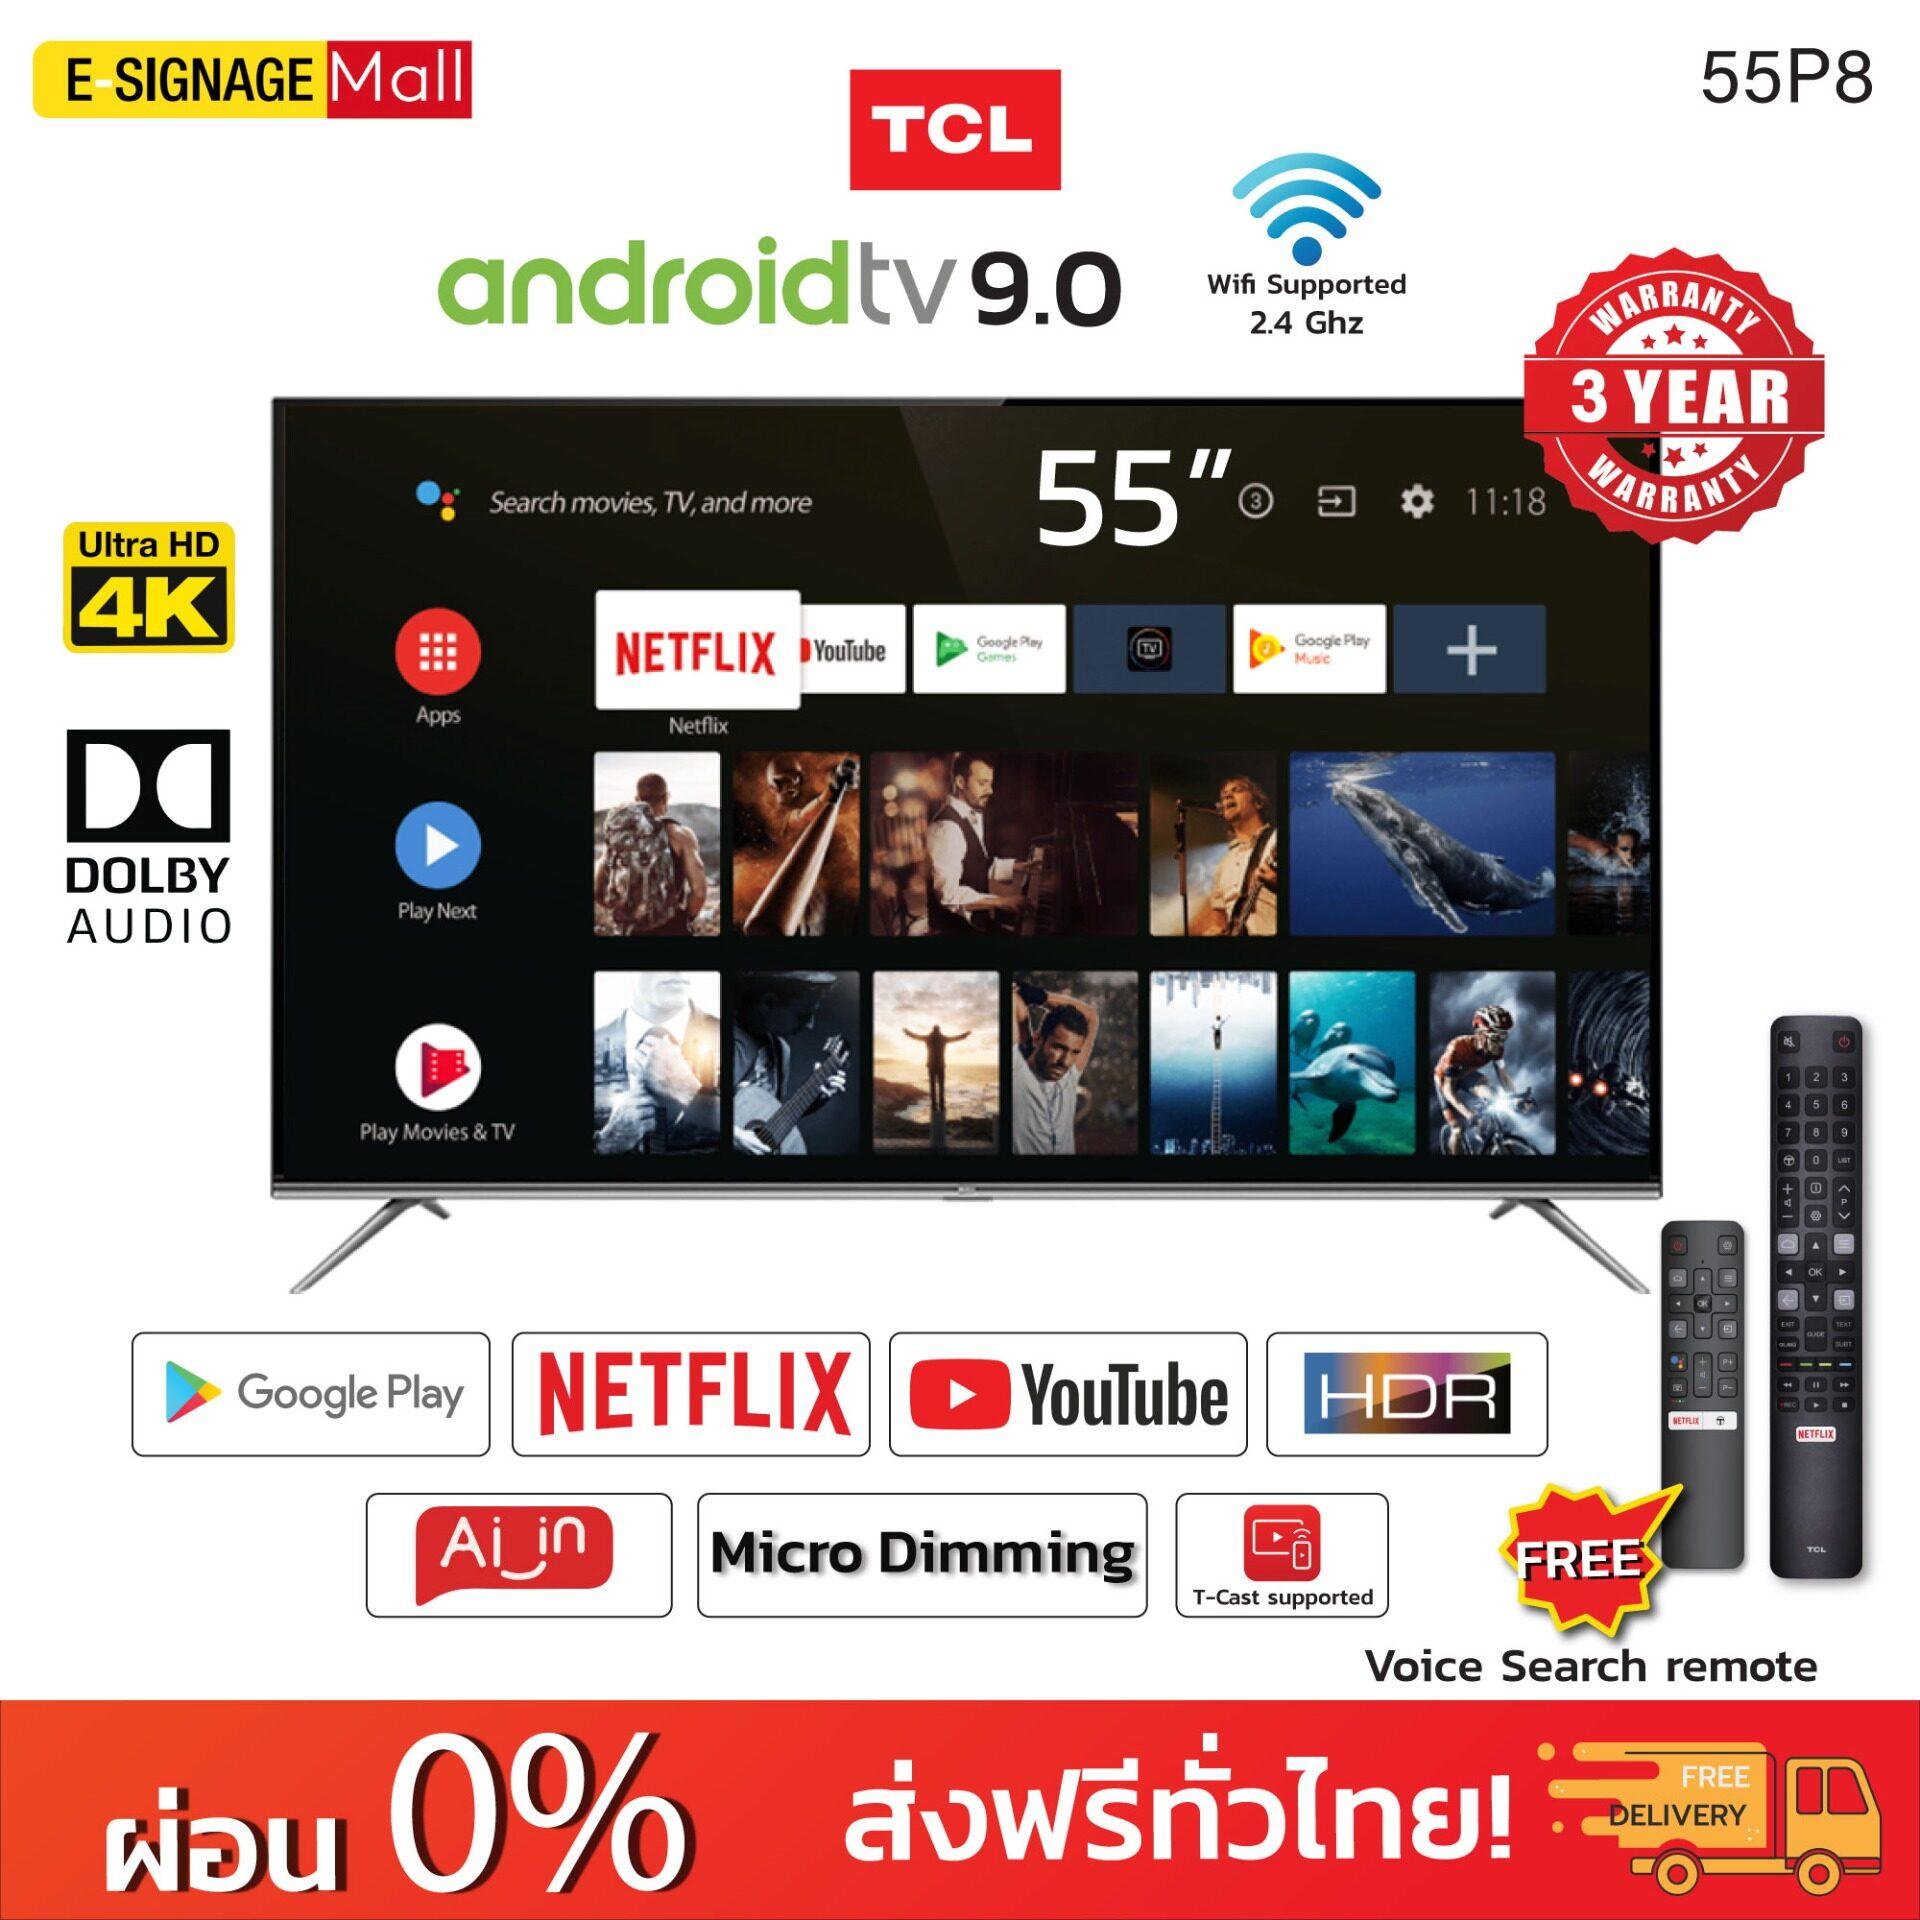 Tcl Android9.0 Tv 55p8 ขนาด 55นิ้ว ประกัน3ปี ผ่อน 0% ขอบบาง ดูบอล ใหม่สุด 2020 แอนดรอยด์ทีวี Led Tv ทีวีดู Netflix Youtube ภาพชัด คมชัด เสียงดี Wifi 4k 3840 X 2160 แถมฟรี Voice Search Remote / Smart Tv รองรับ Usb Hdmi ของขวัญปีใหม่.